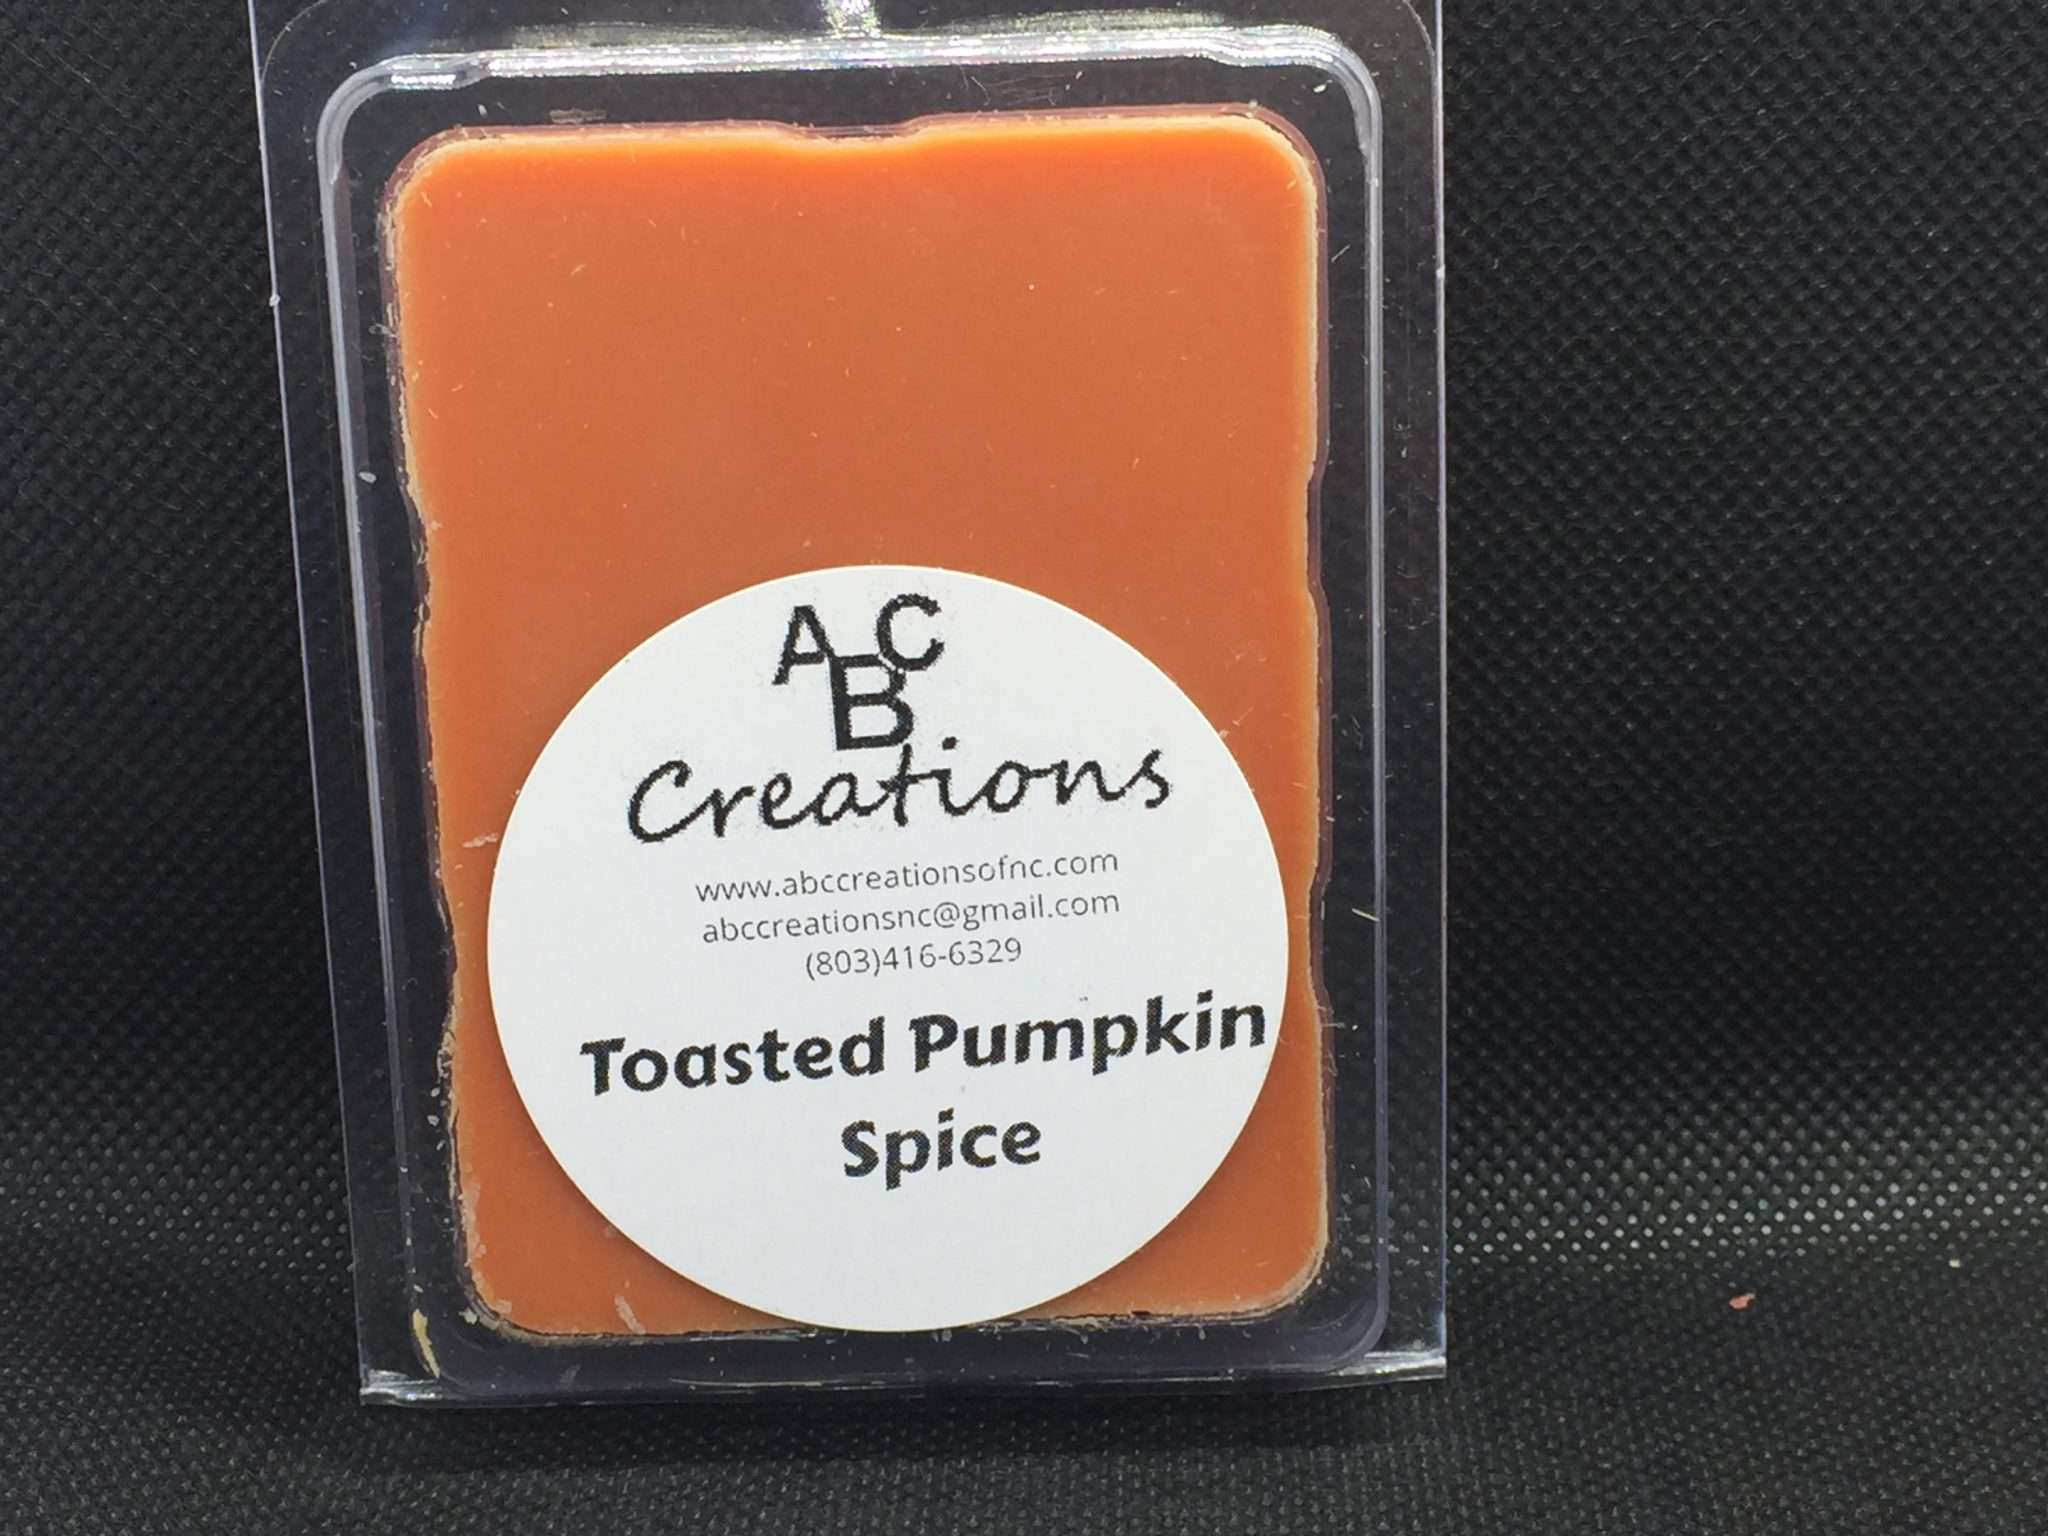 Toasted Pumpkin Spice Soy Wax Melt